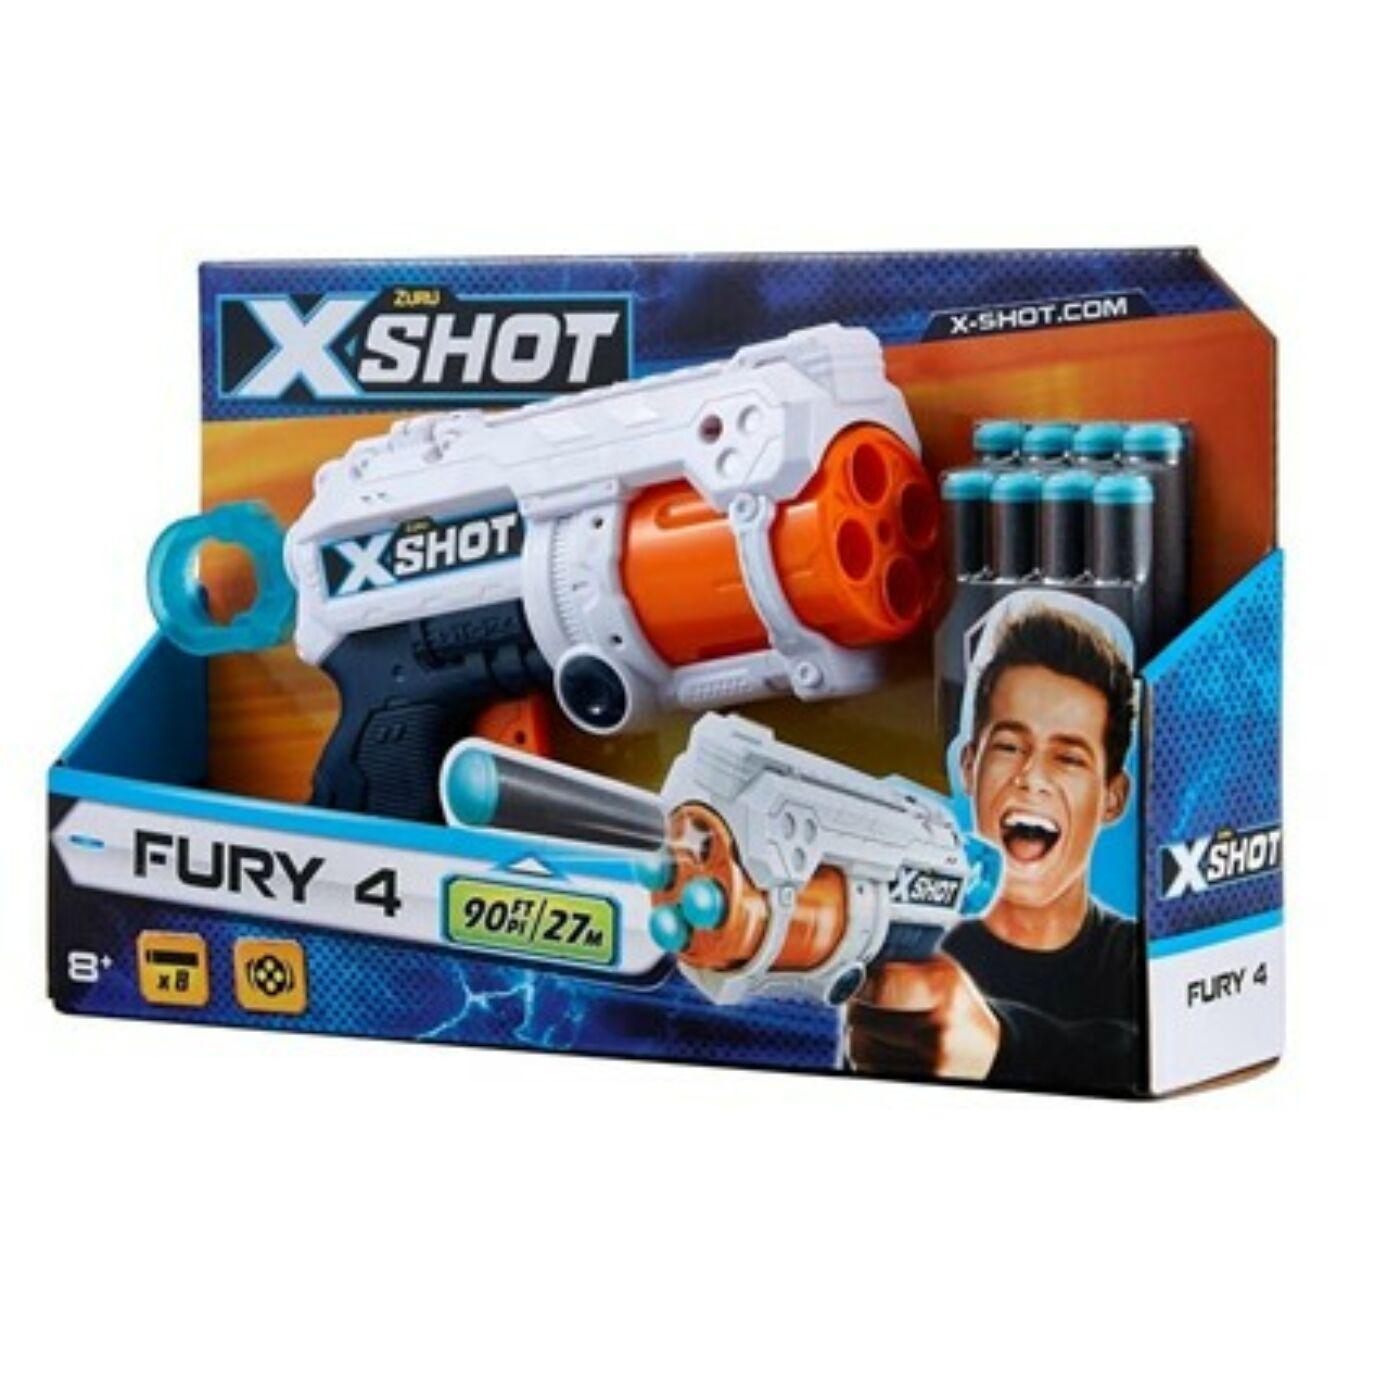 Xshot Fury 4